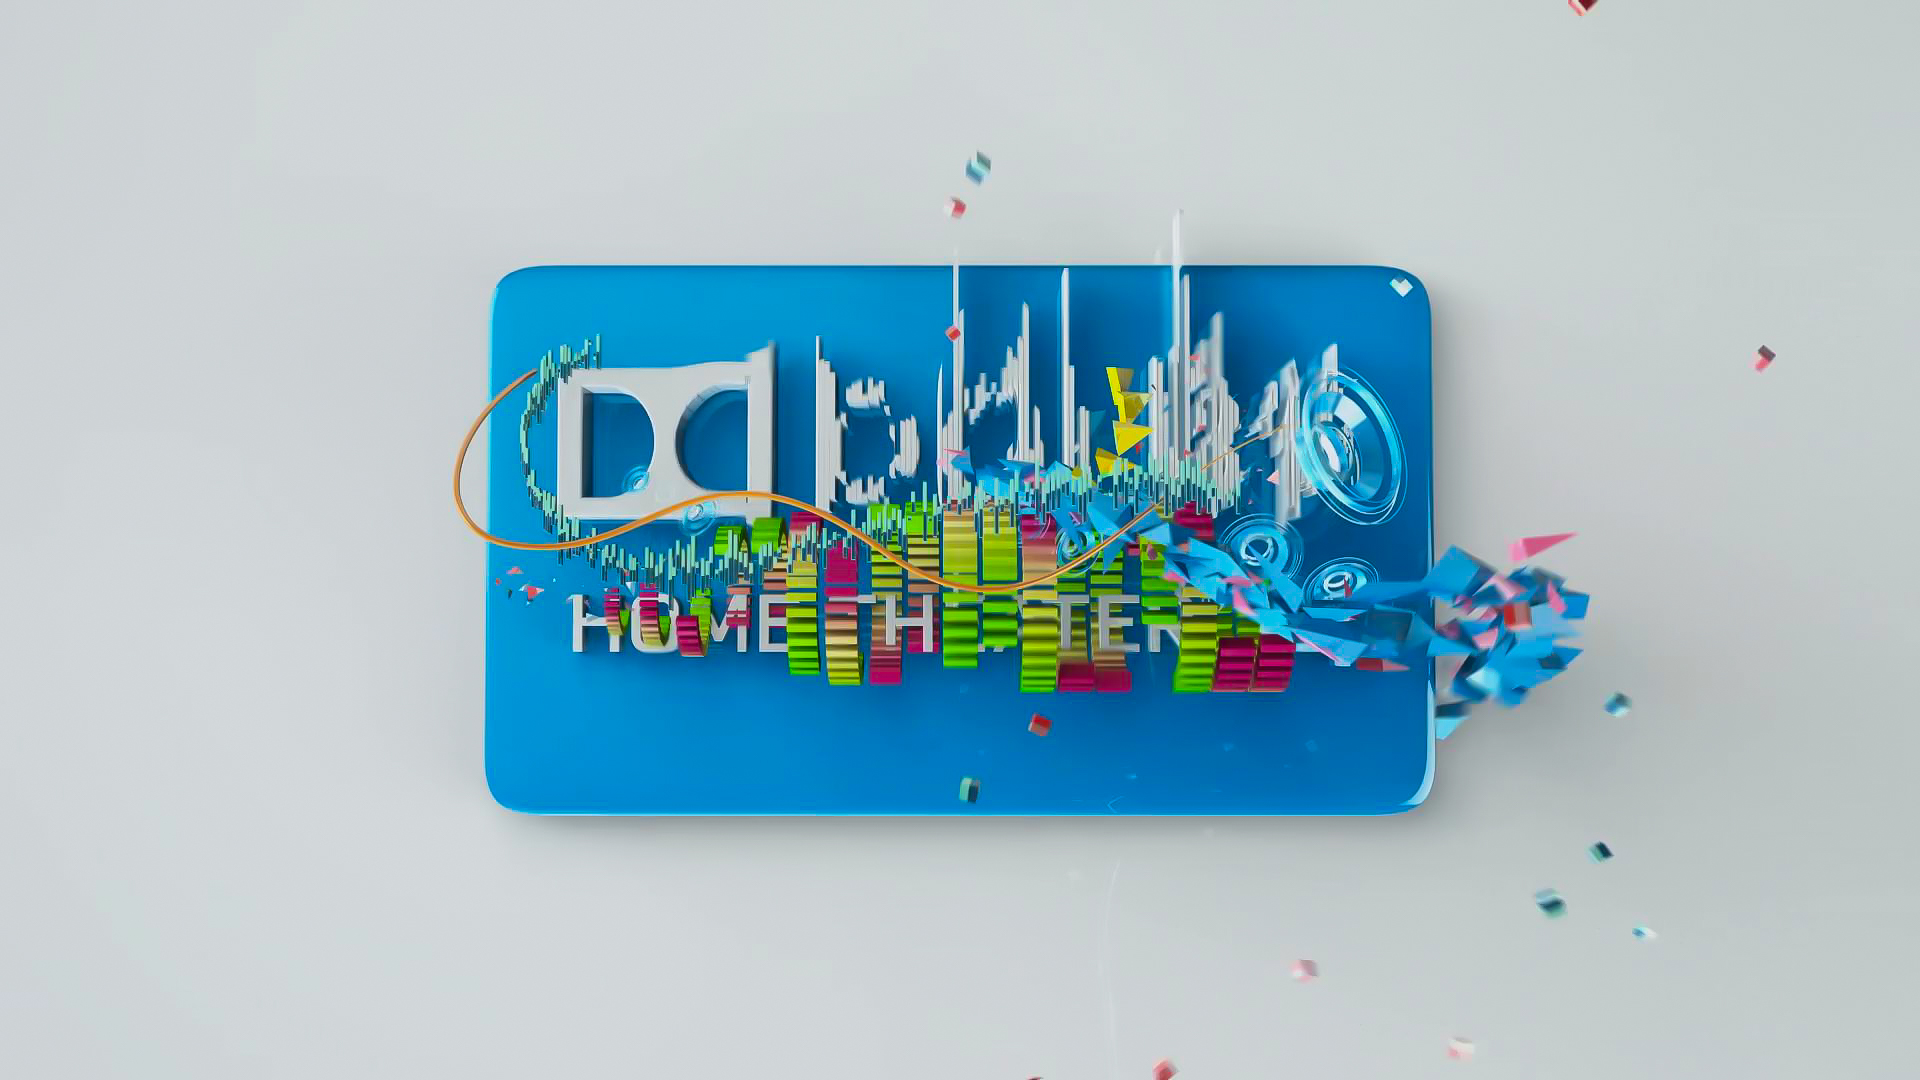 Dolby.mp4_180.jpg